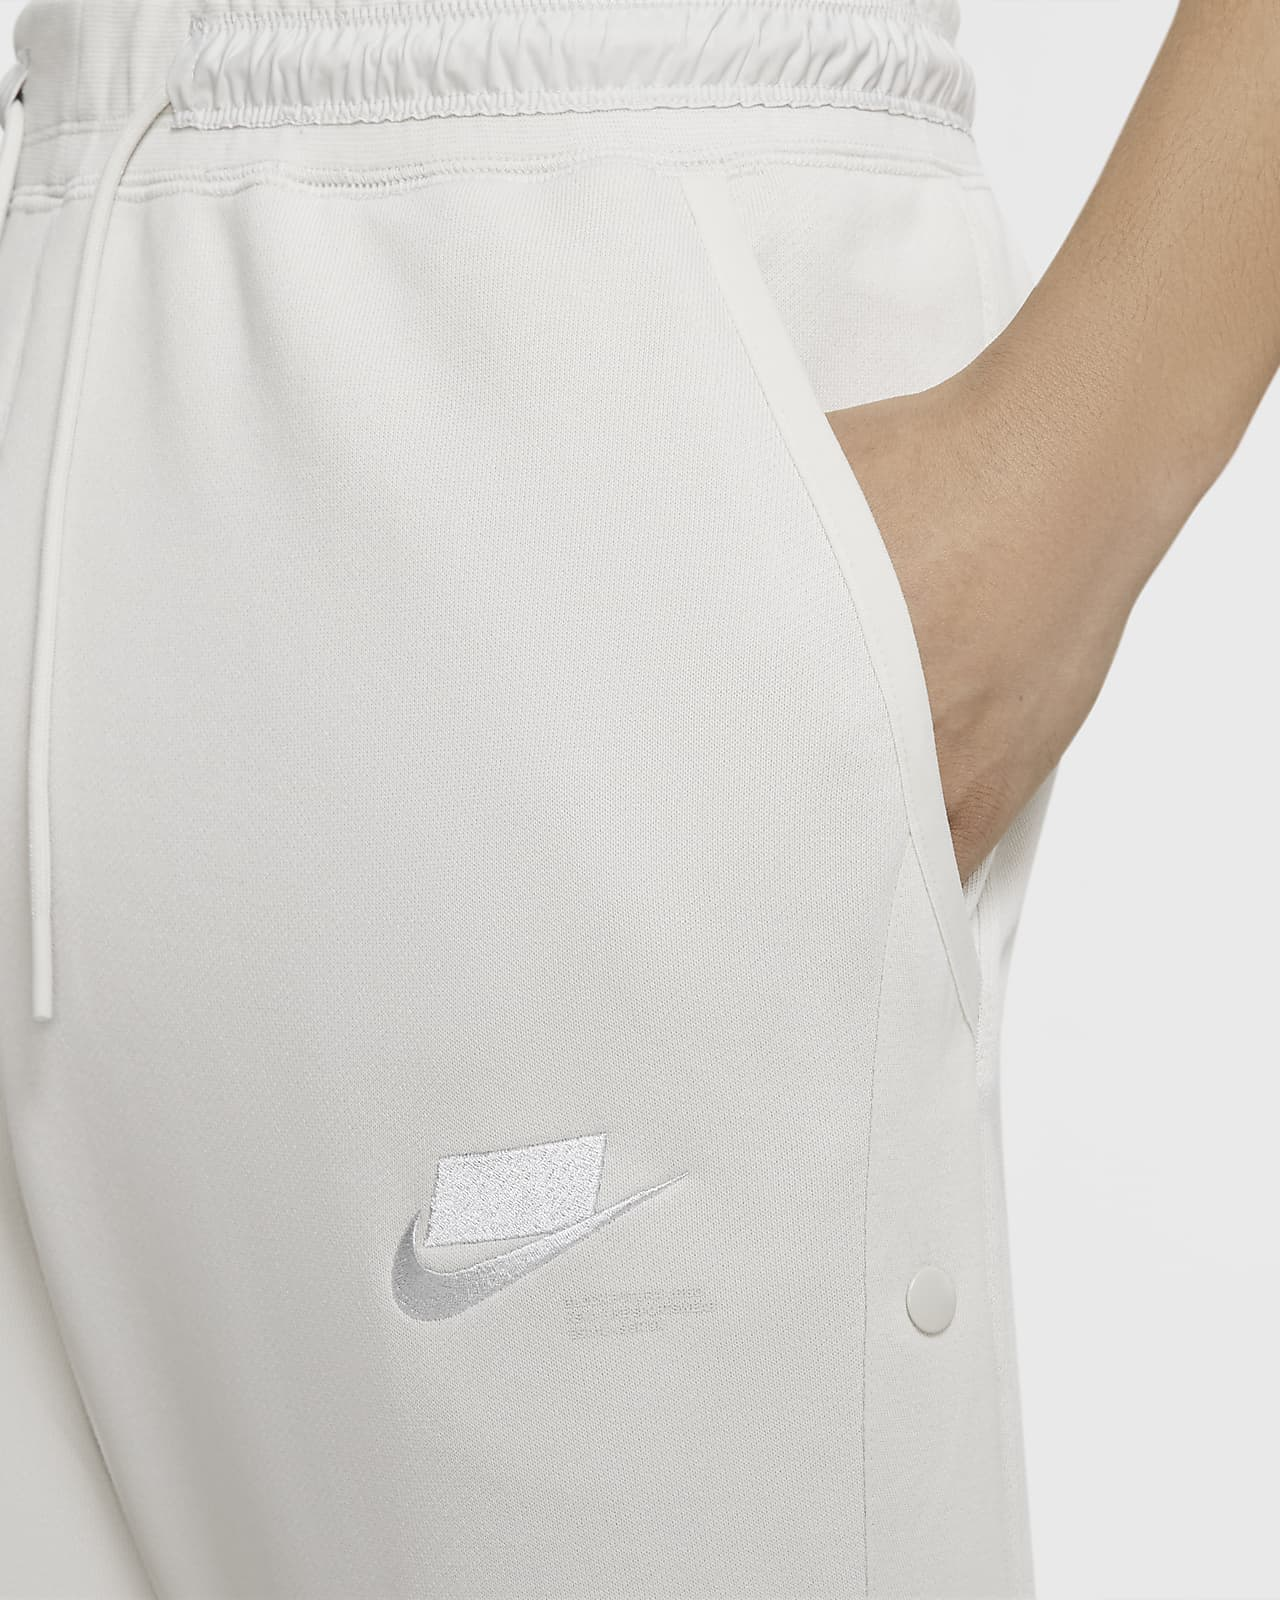 Nike Sportswear NSW Men's French Terry